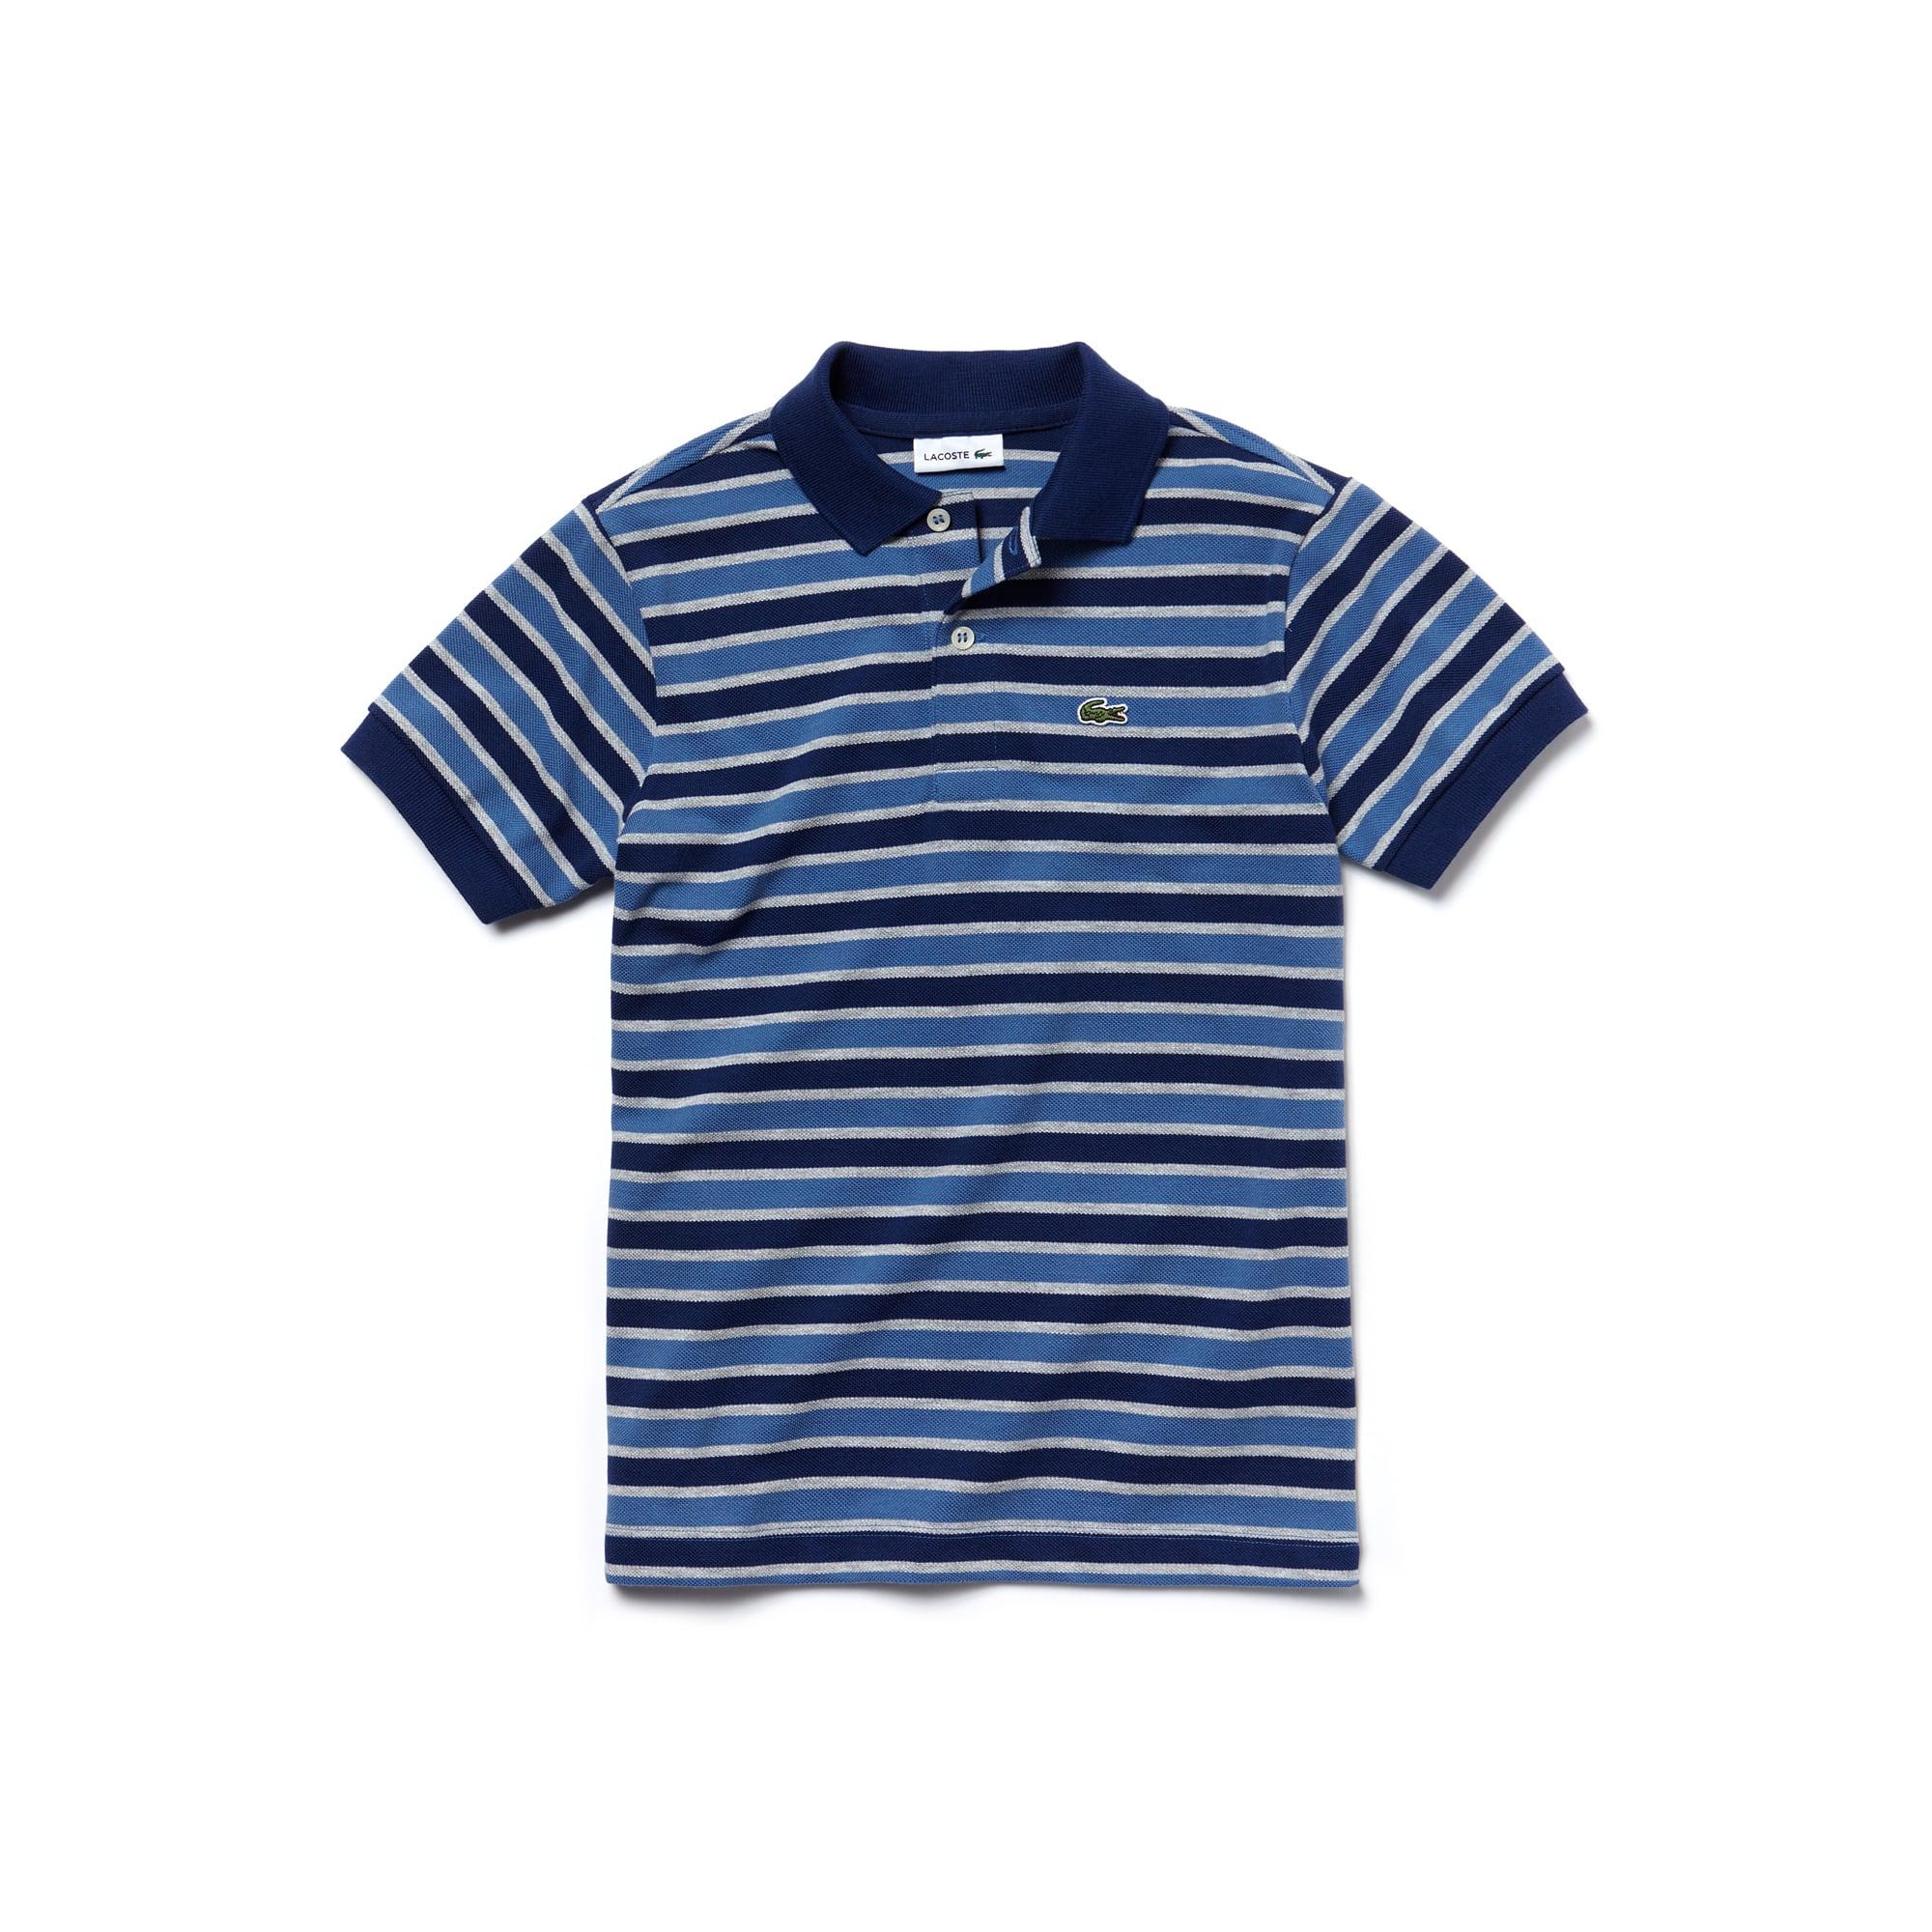 Boys'  Striped Cotton Petit Piqué Polo